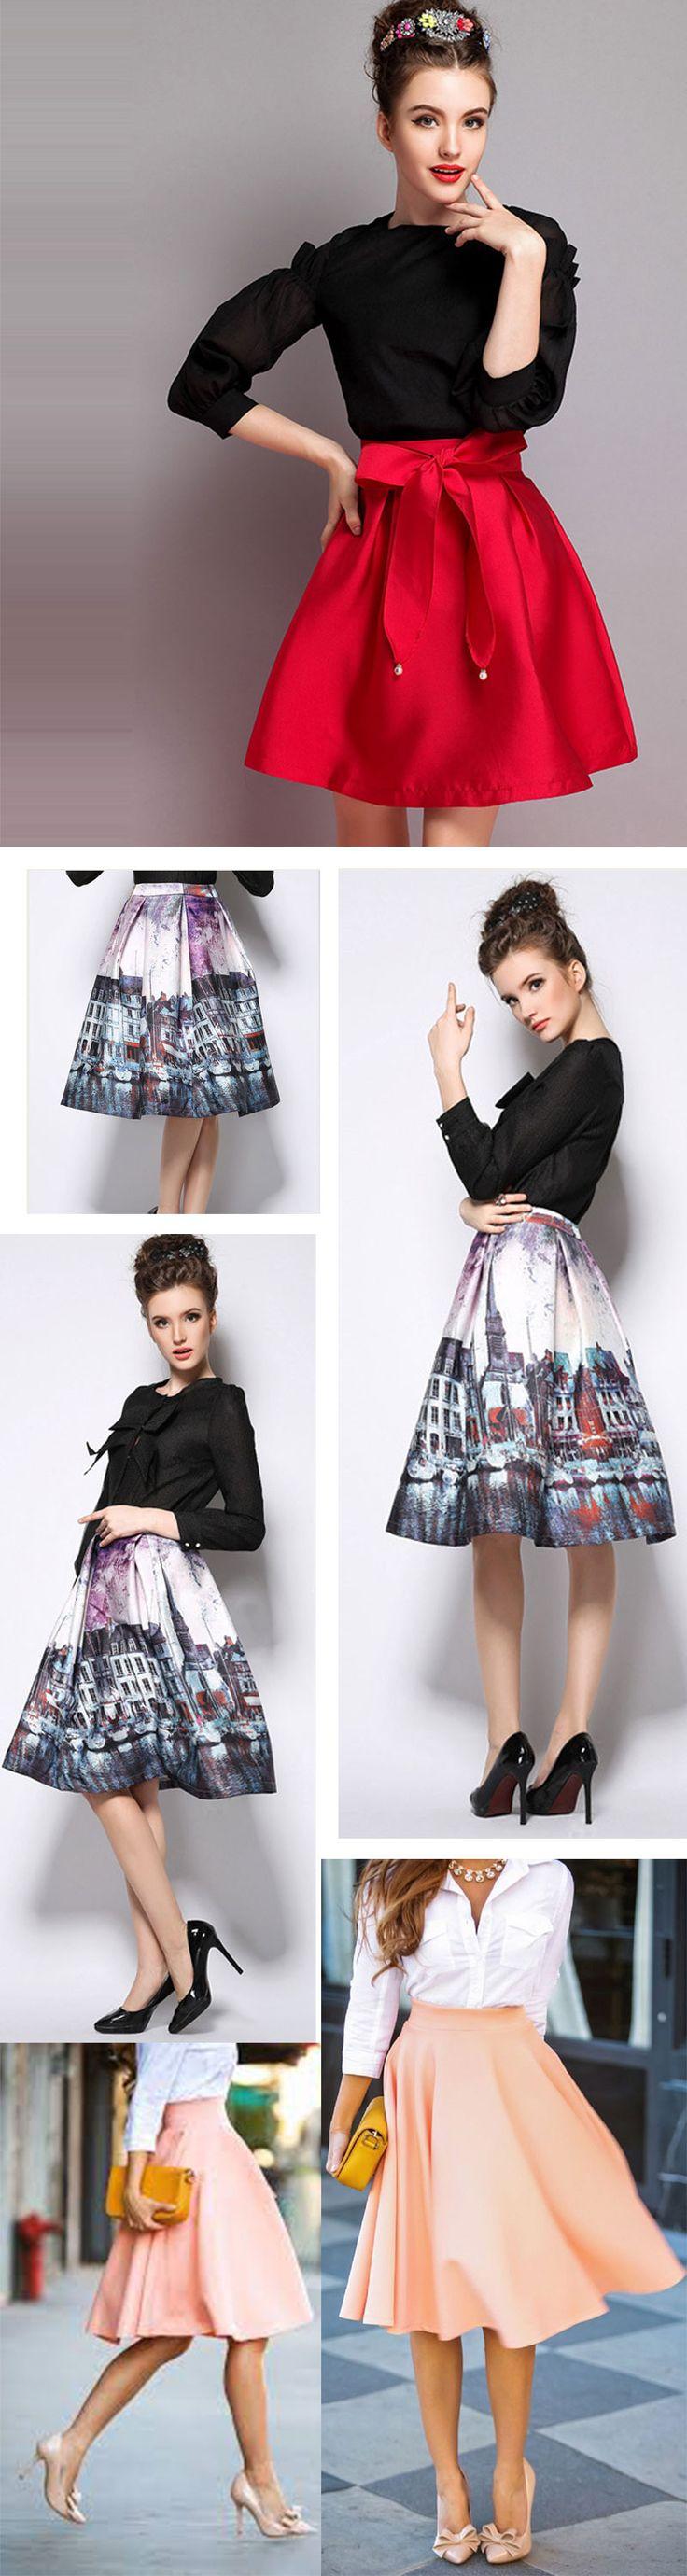 Fashion Women Knee Length Skirt, Popular Styles